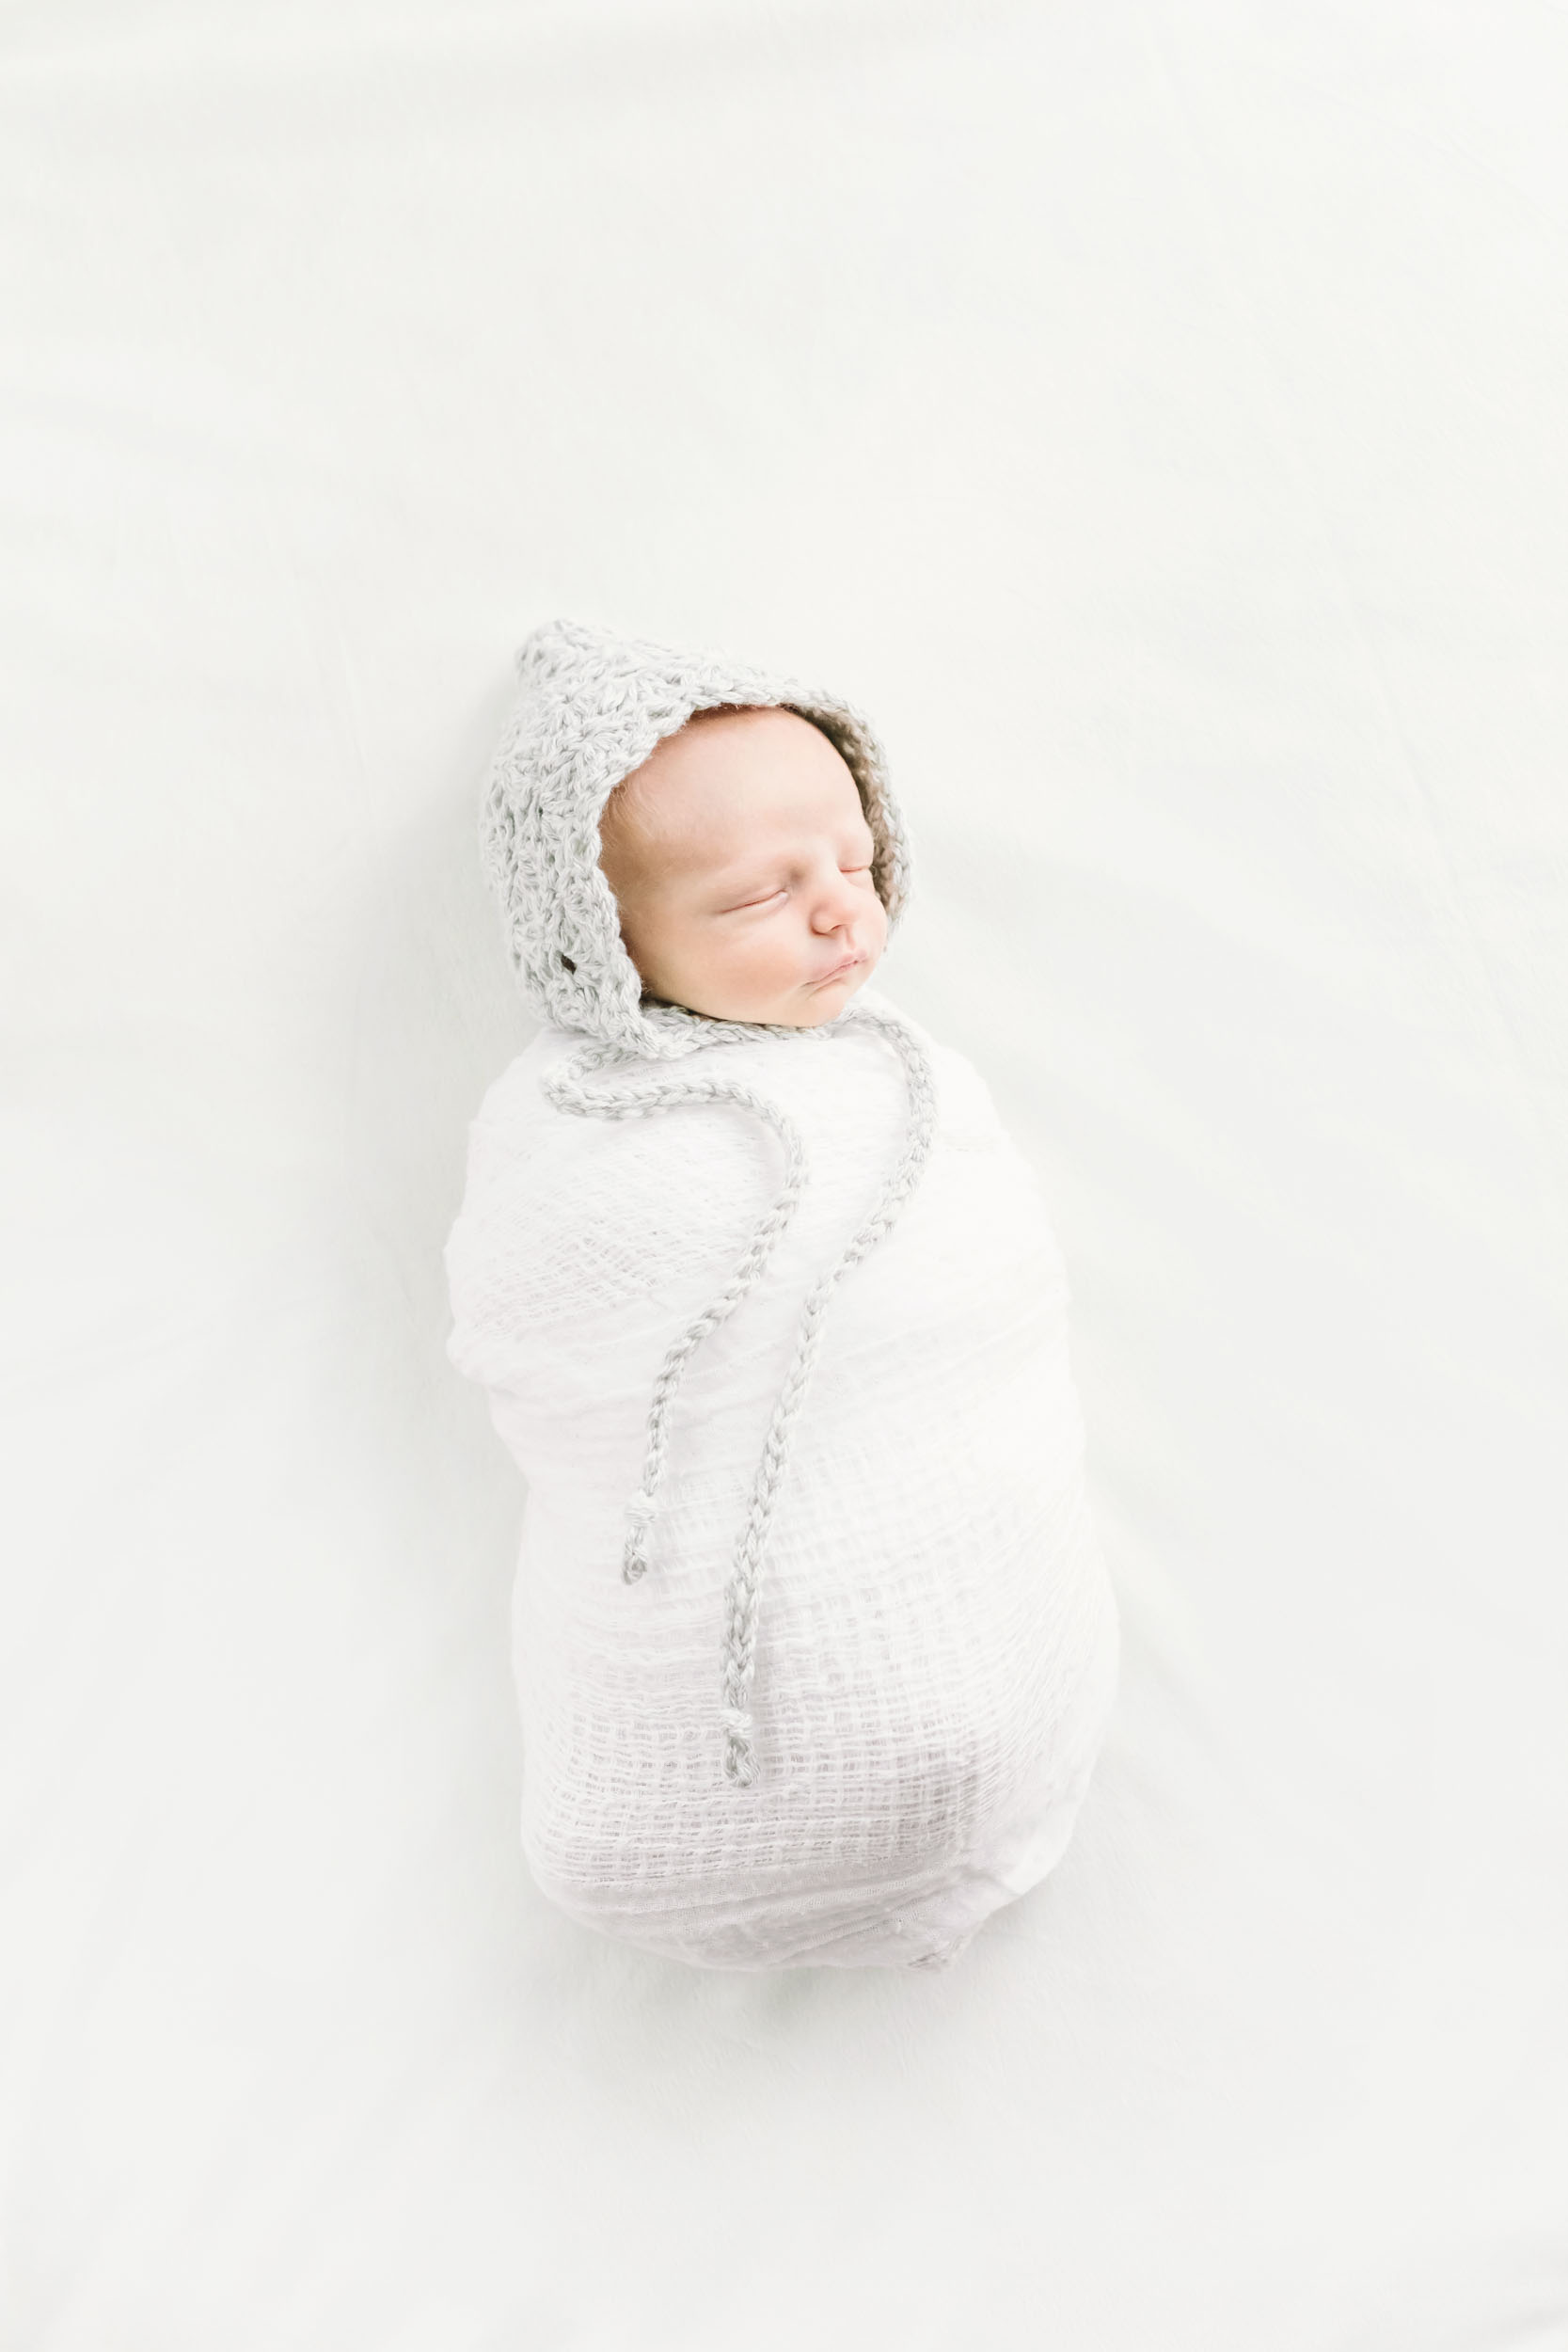 Geneva Illinois Newborn Photographer_Cassie Schott Photography_In Home Session_2.jpg